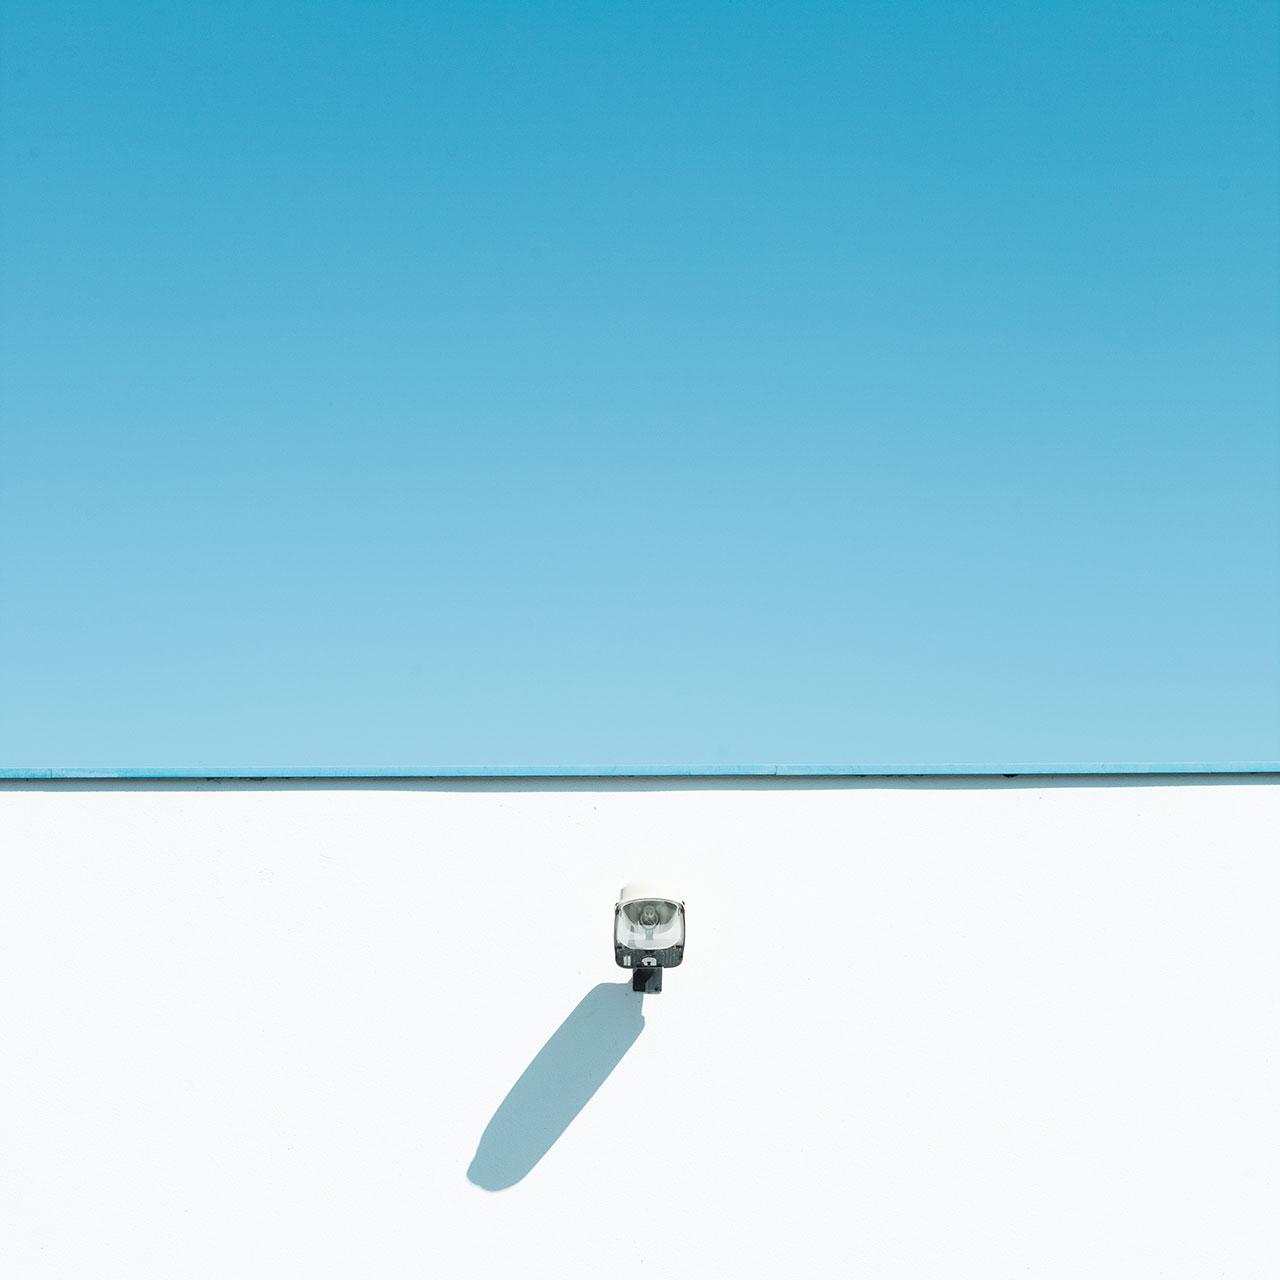 matthieu_venot_photography_goodfromyou-4.jpg